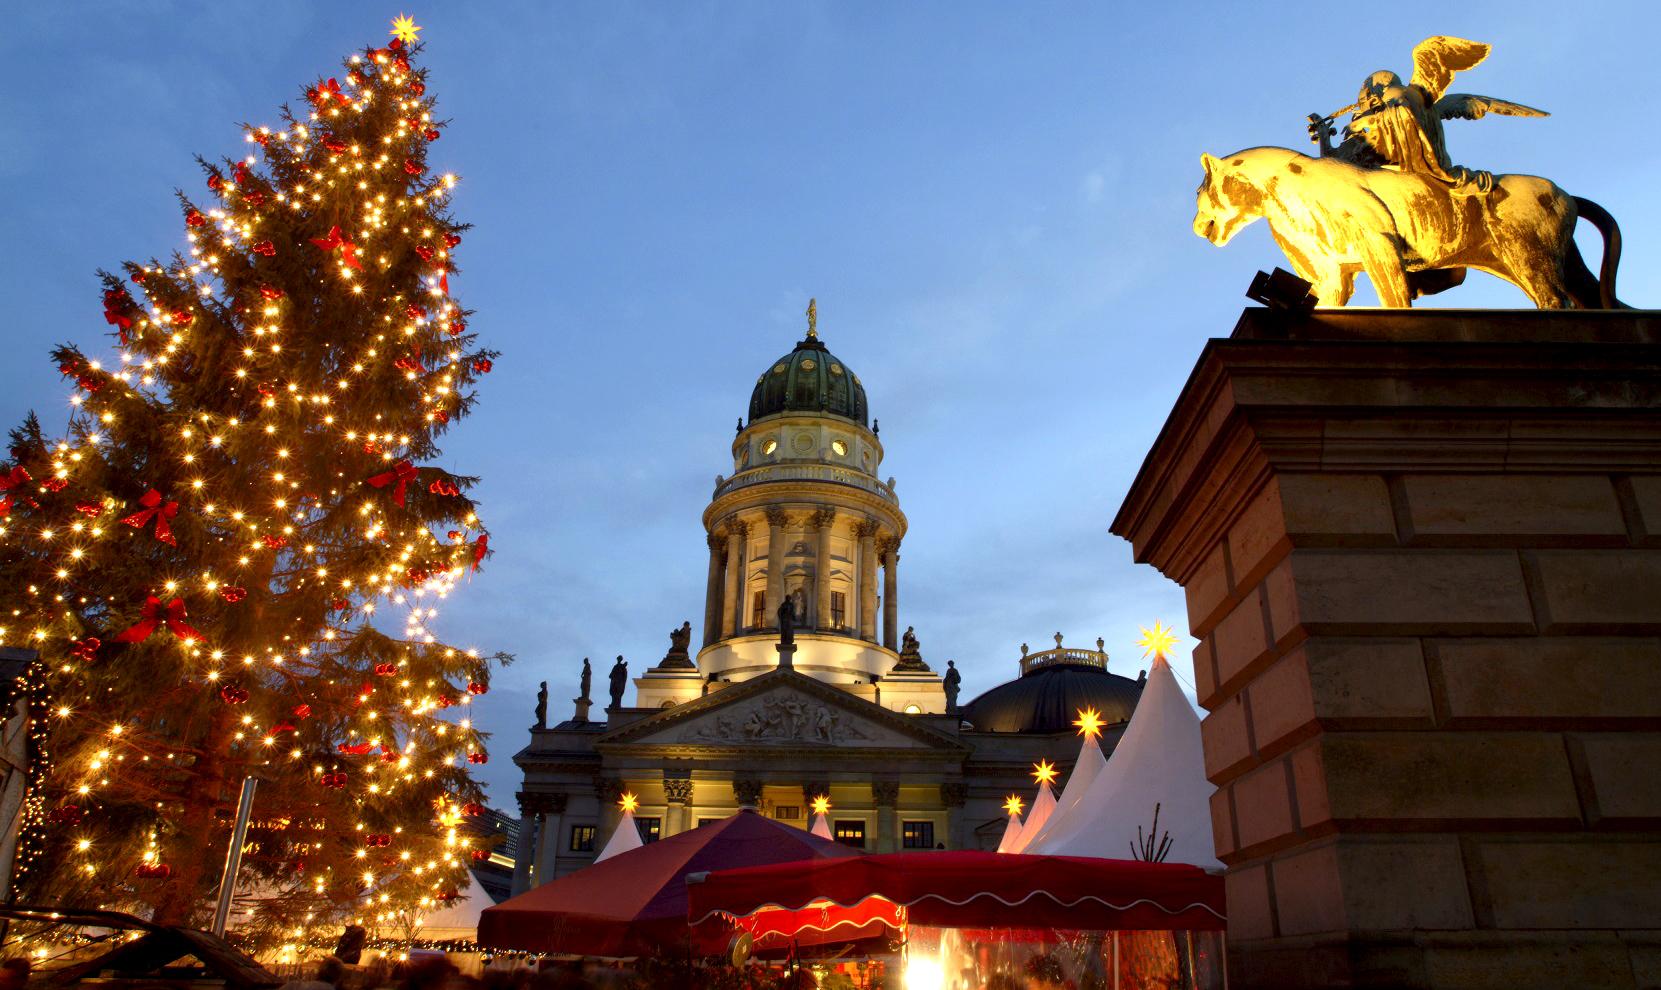 Рождественские ярмарки Вроцлава, Берлина, Дрездена! Раннее бронирование!